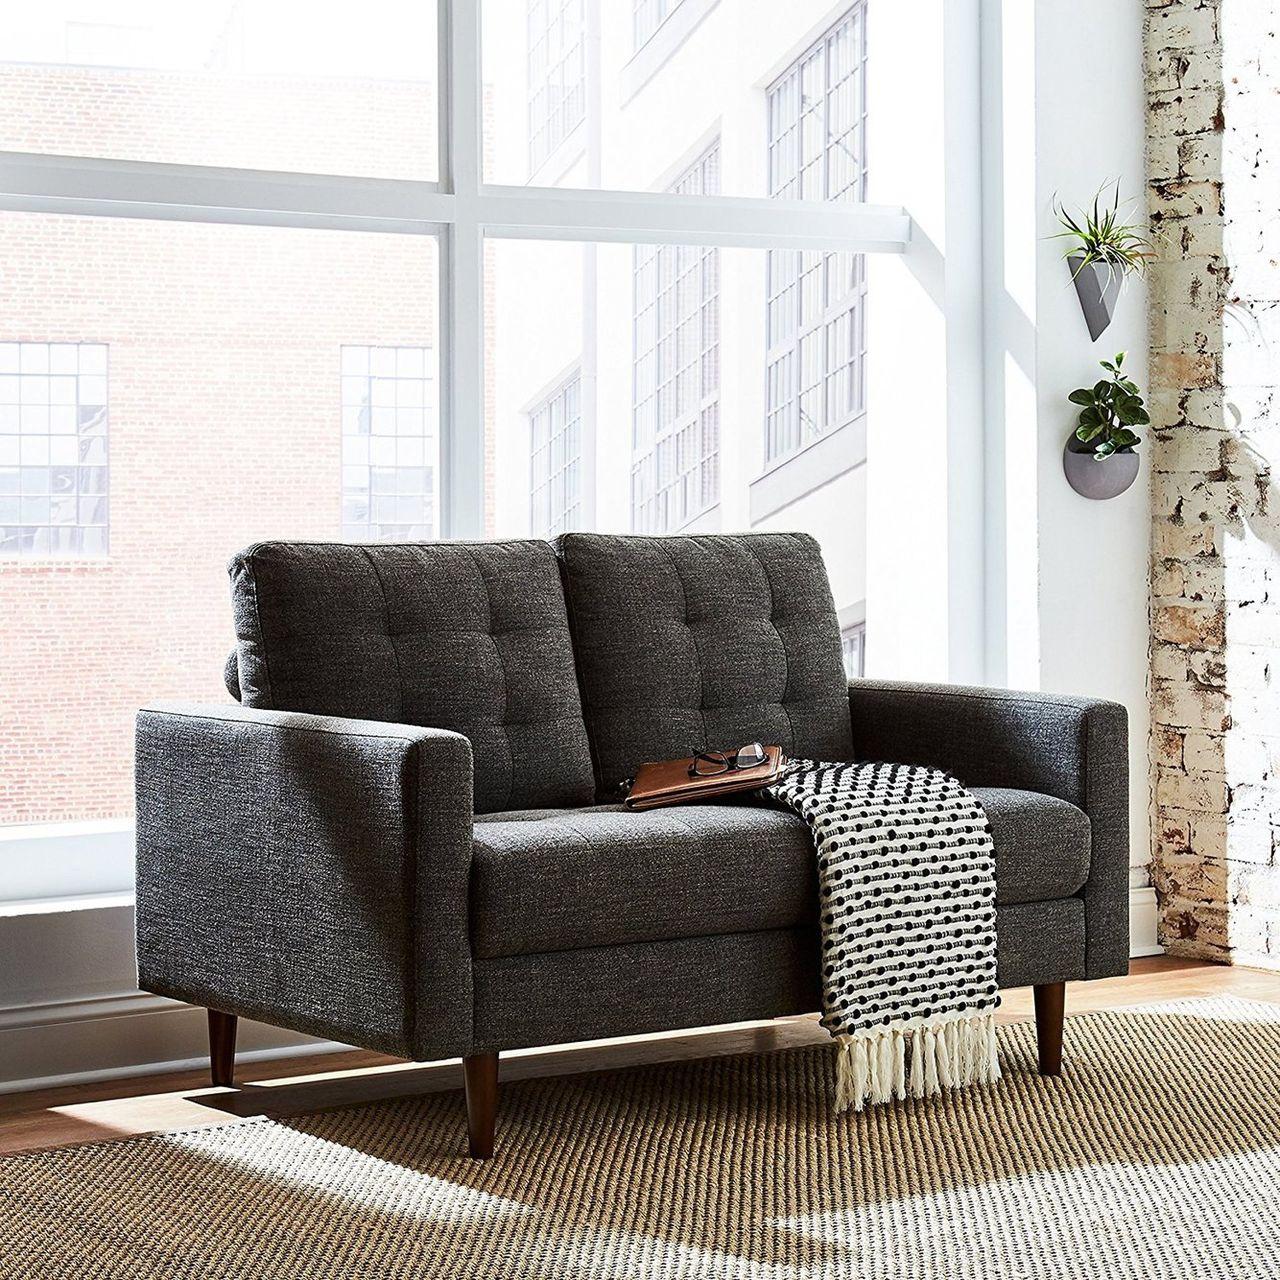 Amazon börjar sälja sina egna möbler